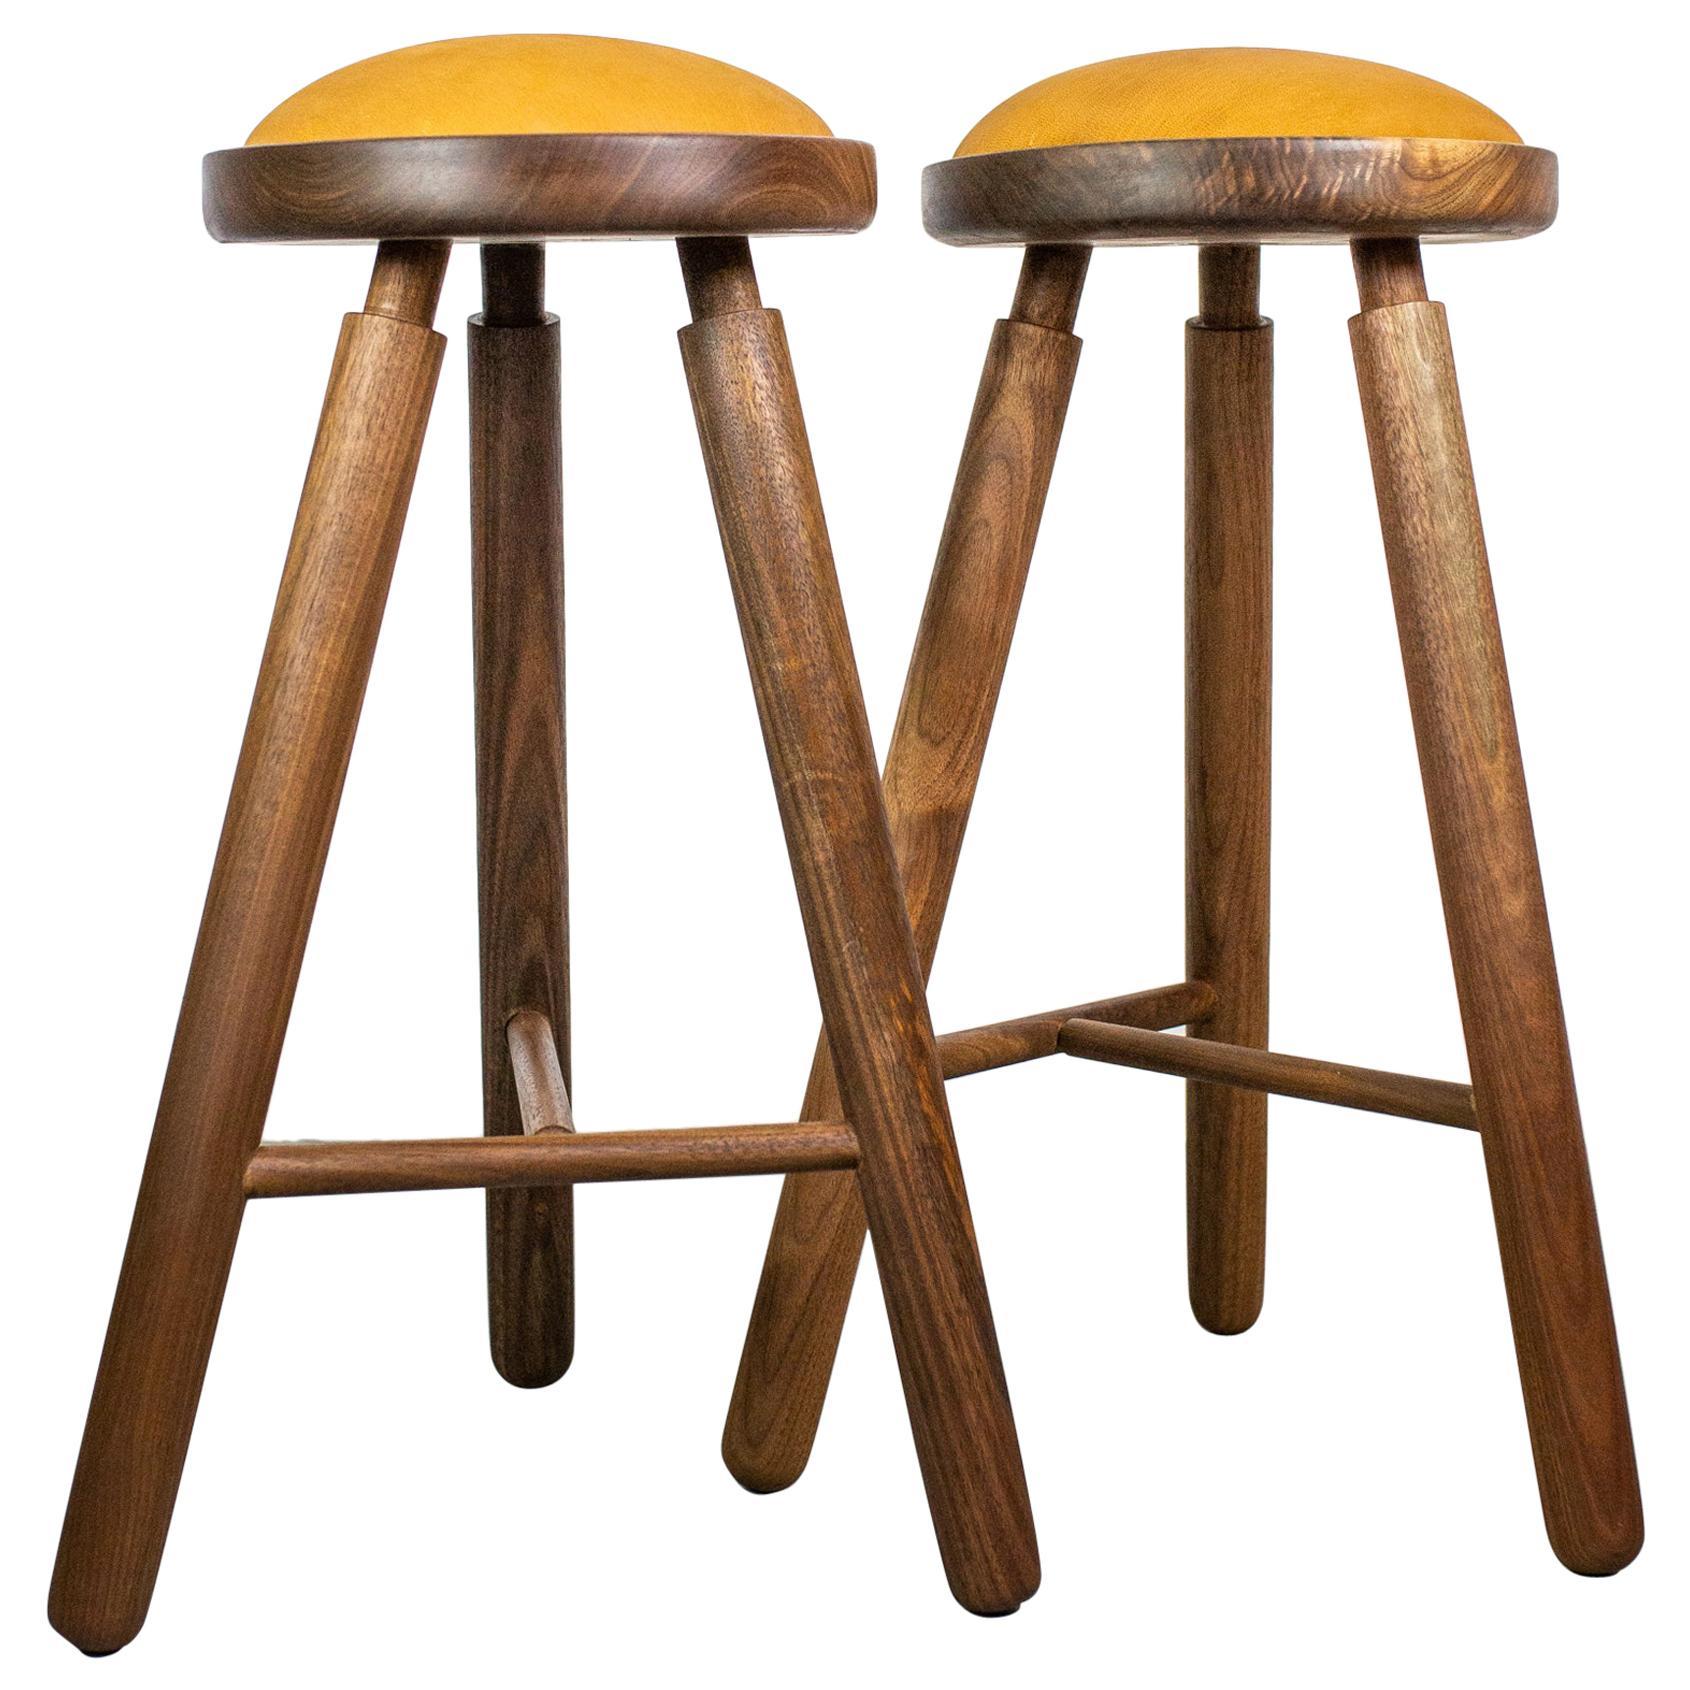 Pair of Michael Rozell Studio Bar Stools Figured Walnut and Leather USA, 2020